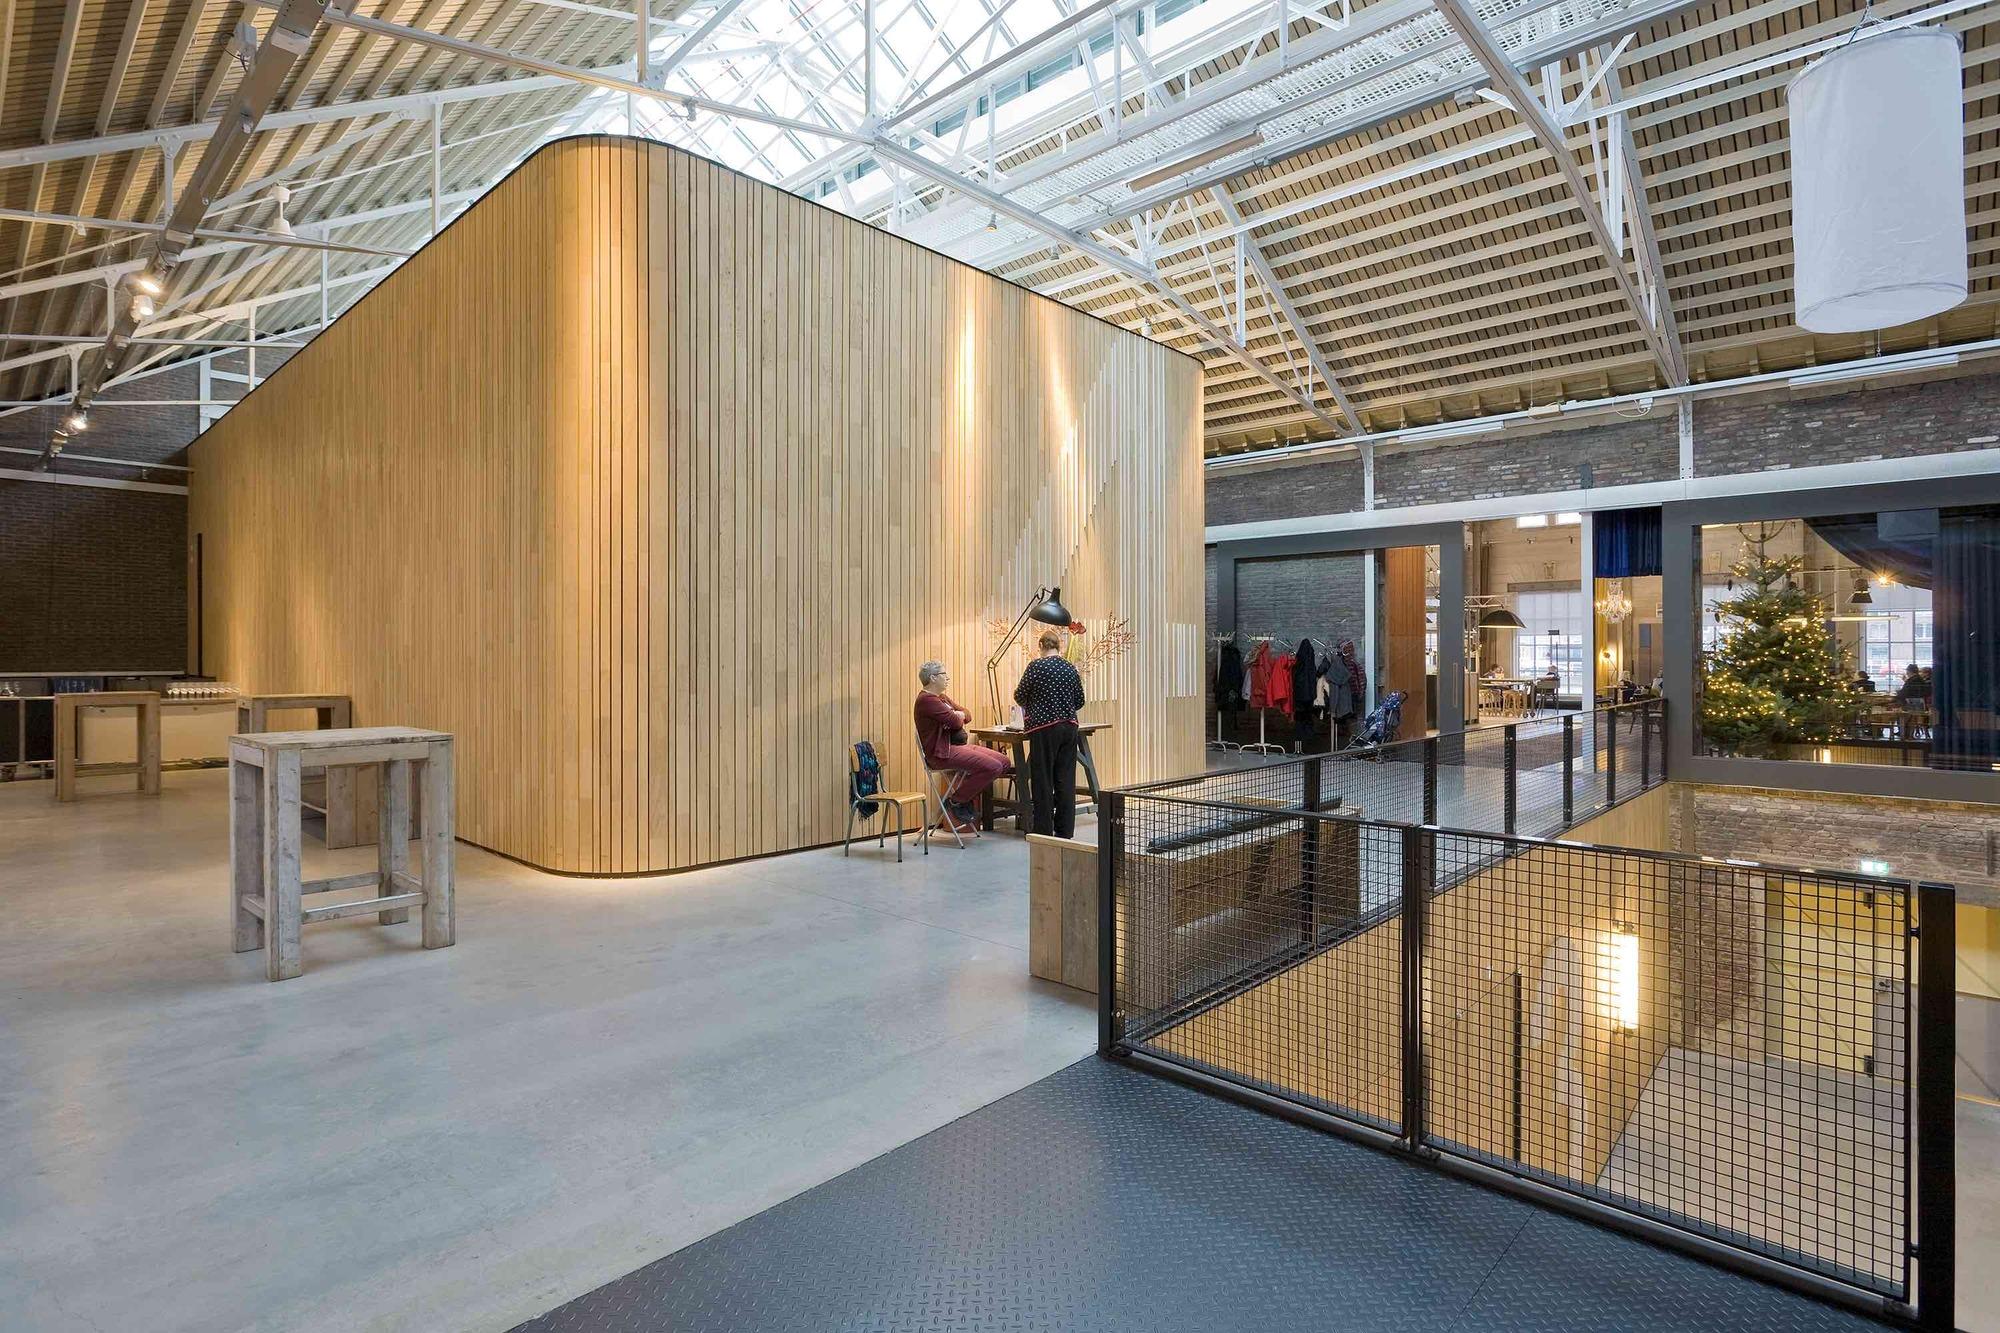 gallery of lumi re cinema maastricht jhk architecten. Black Bedroom Furniture Sets. Home Design Ideas